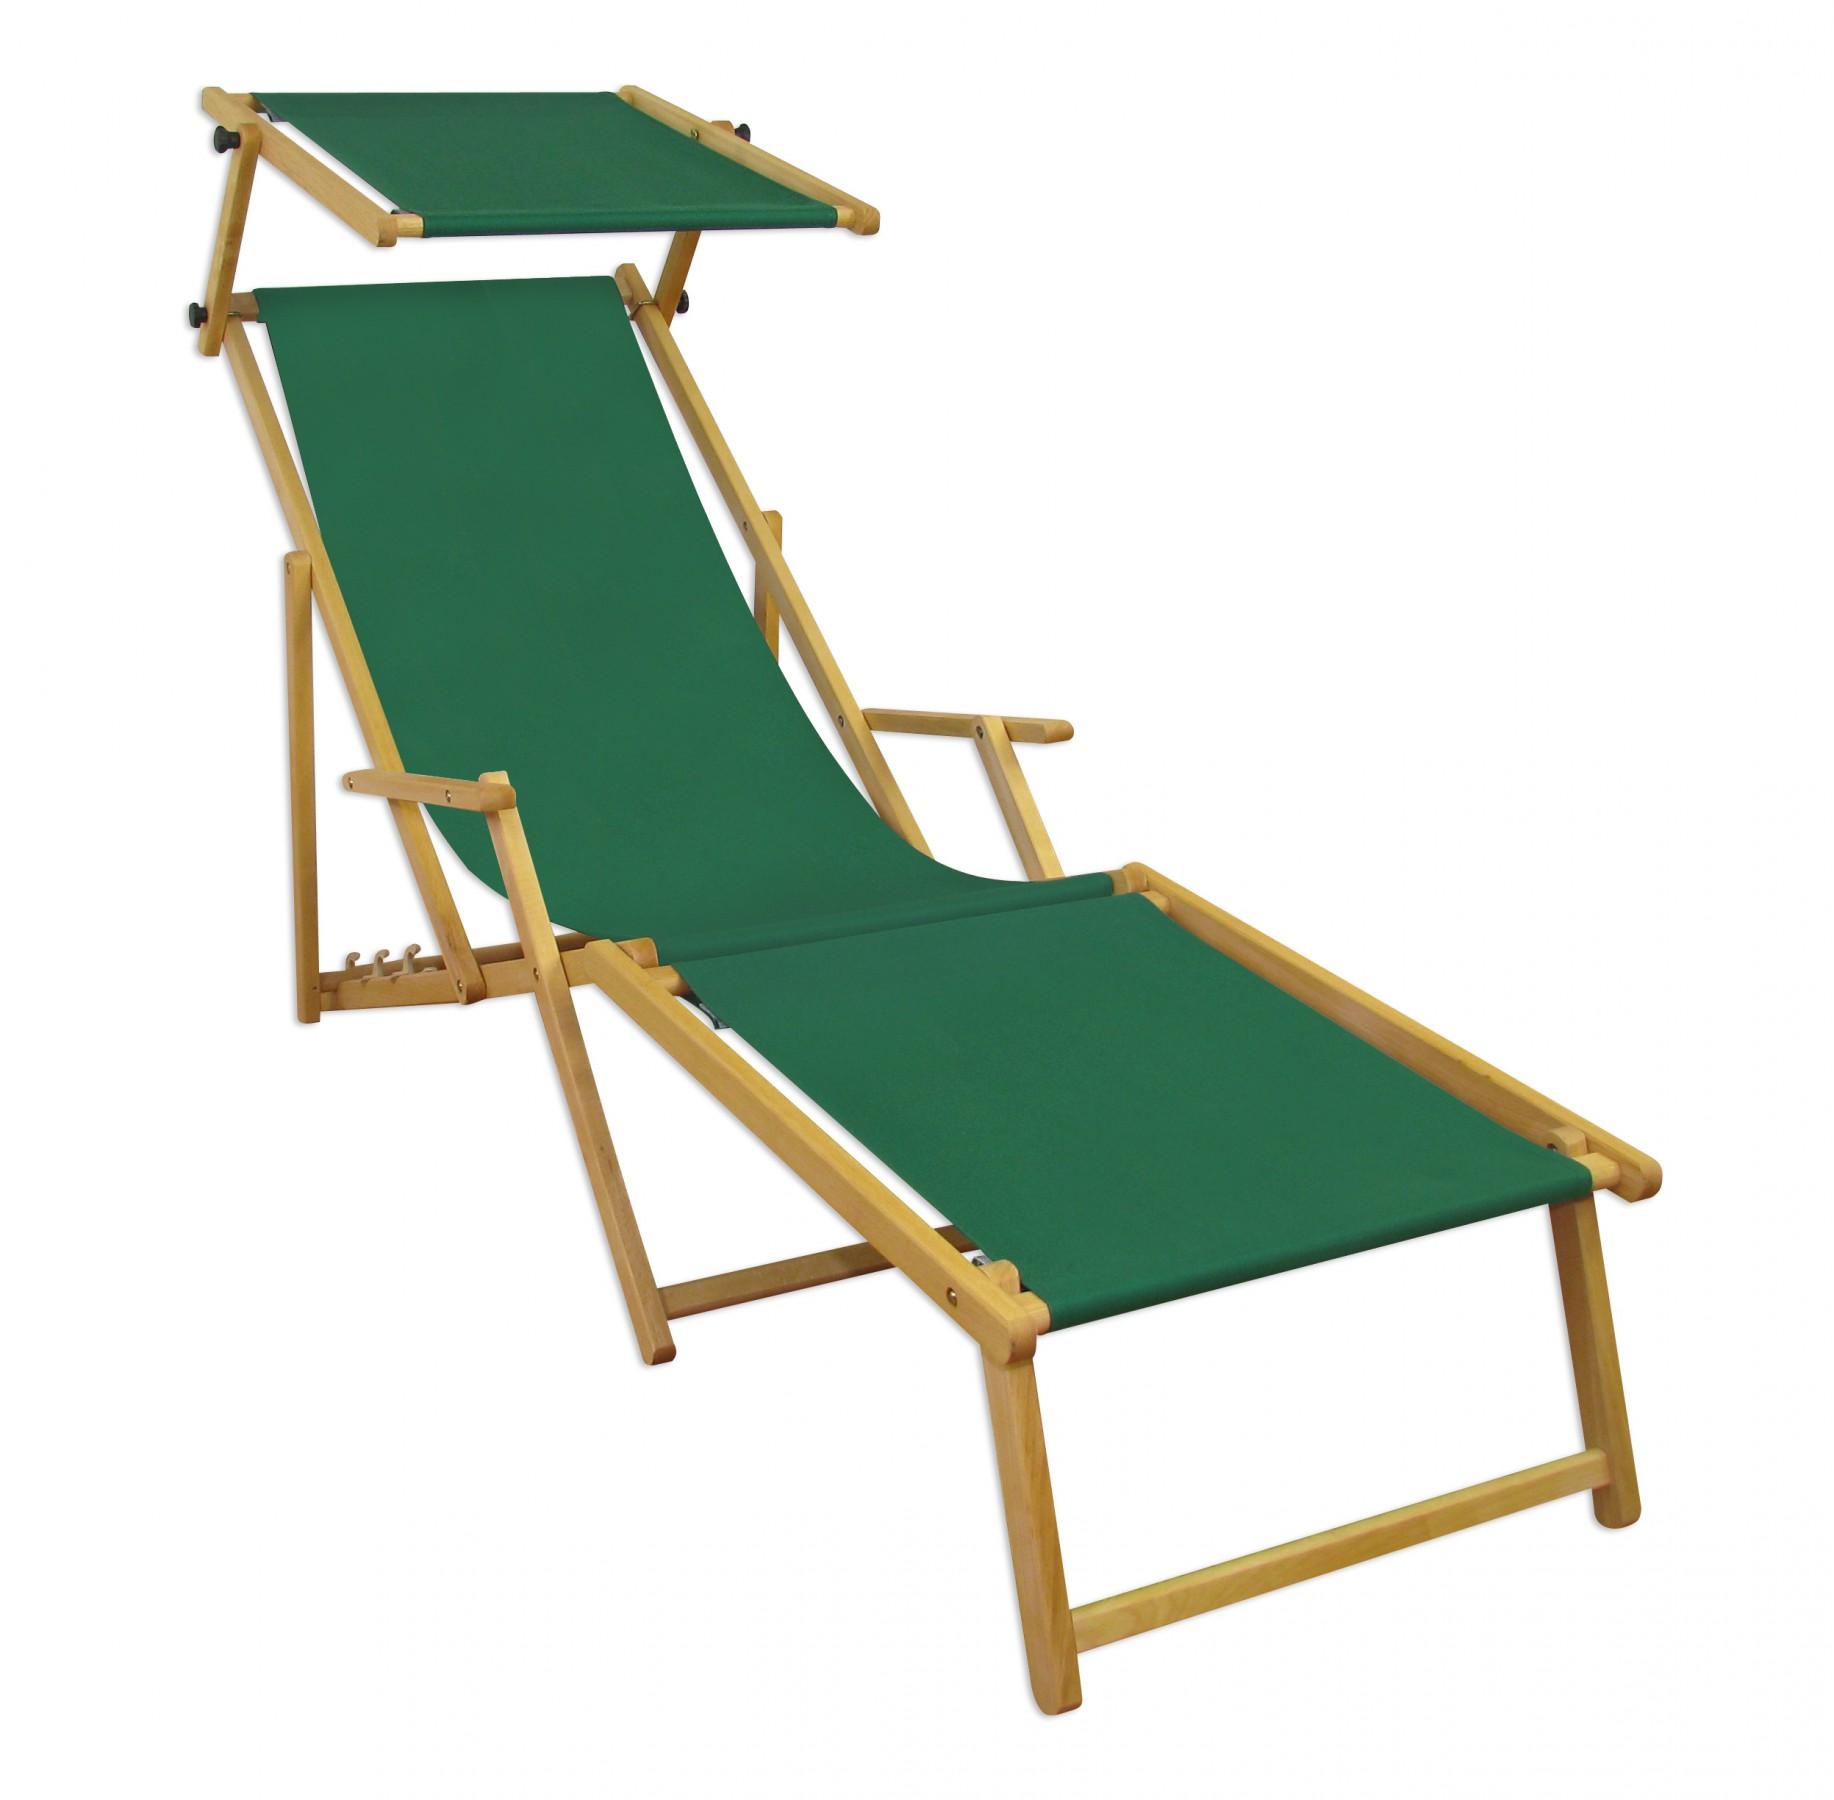 Chaise de jardin terrasse vert longue toit ouvrant bois 10 for Chaise longue jardin plastique vert